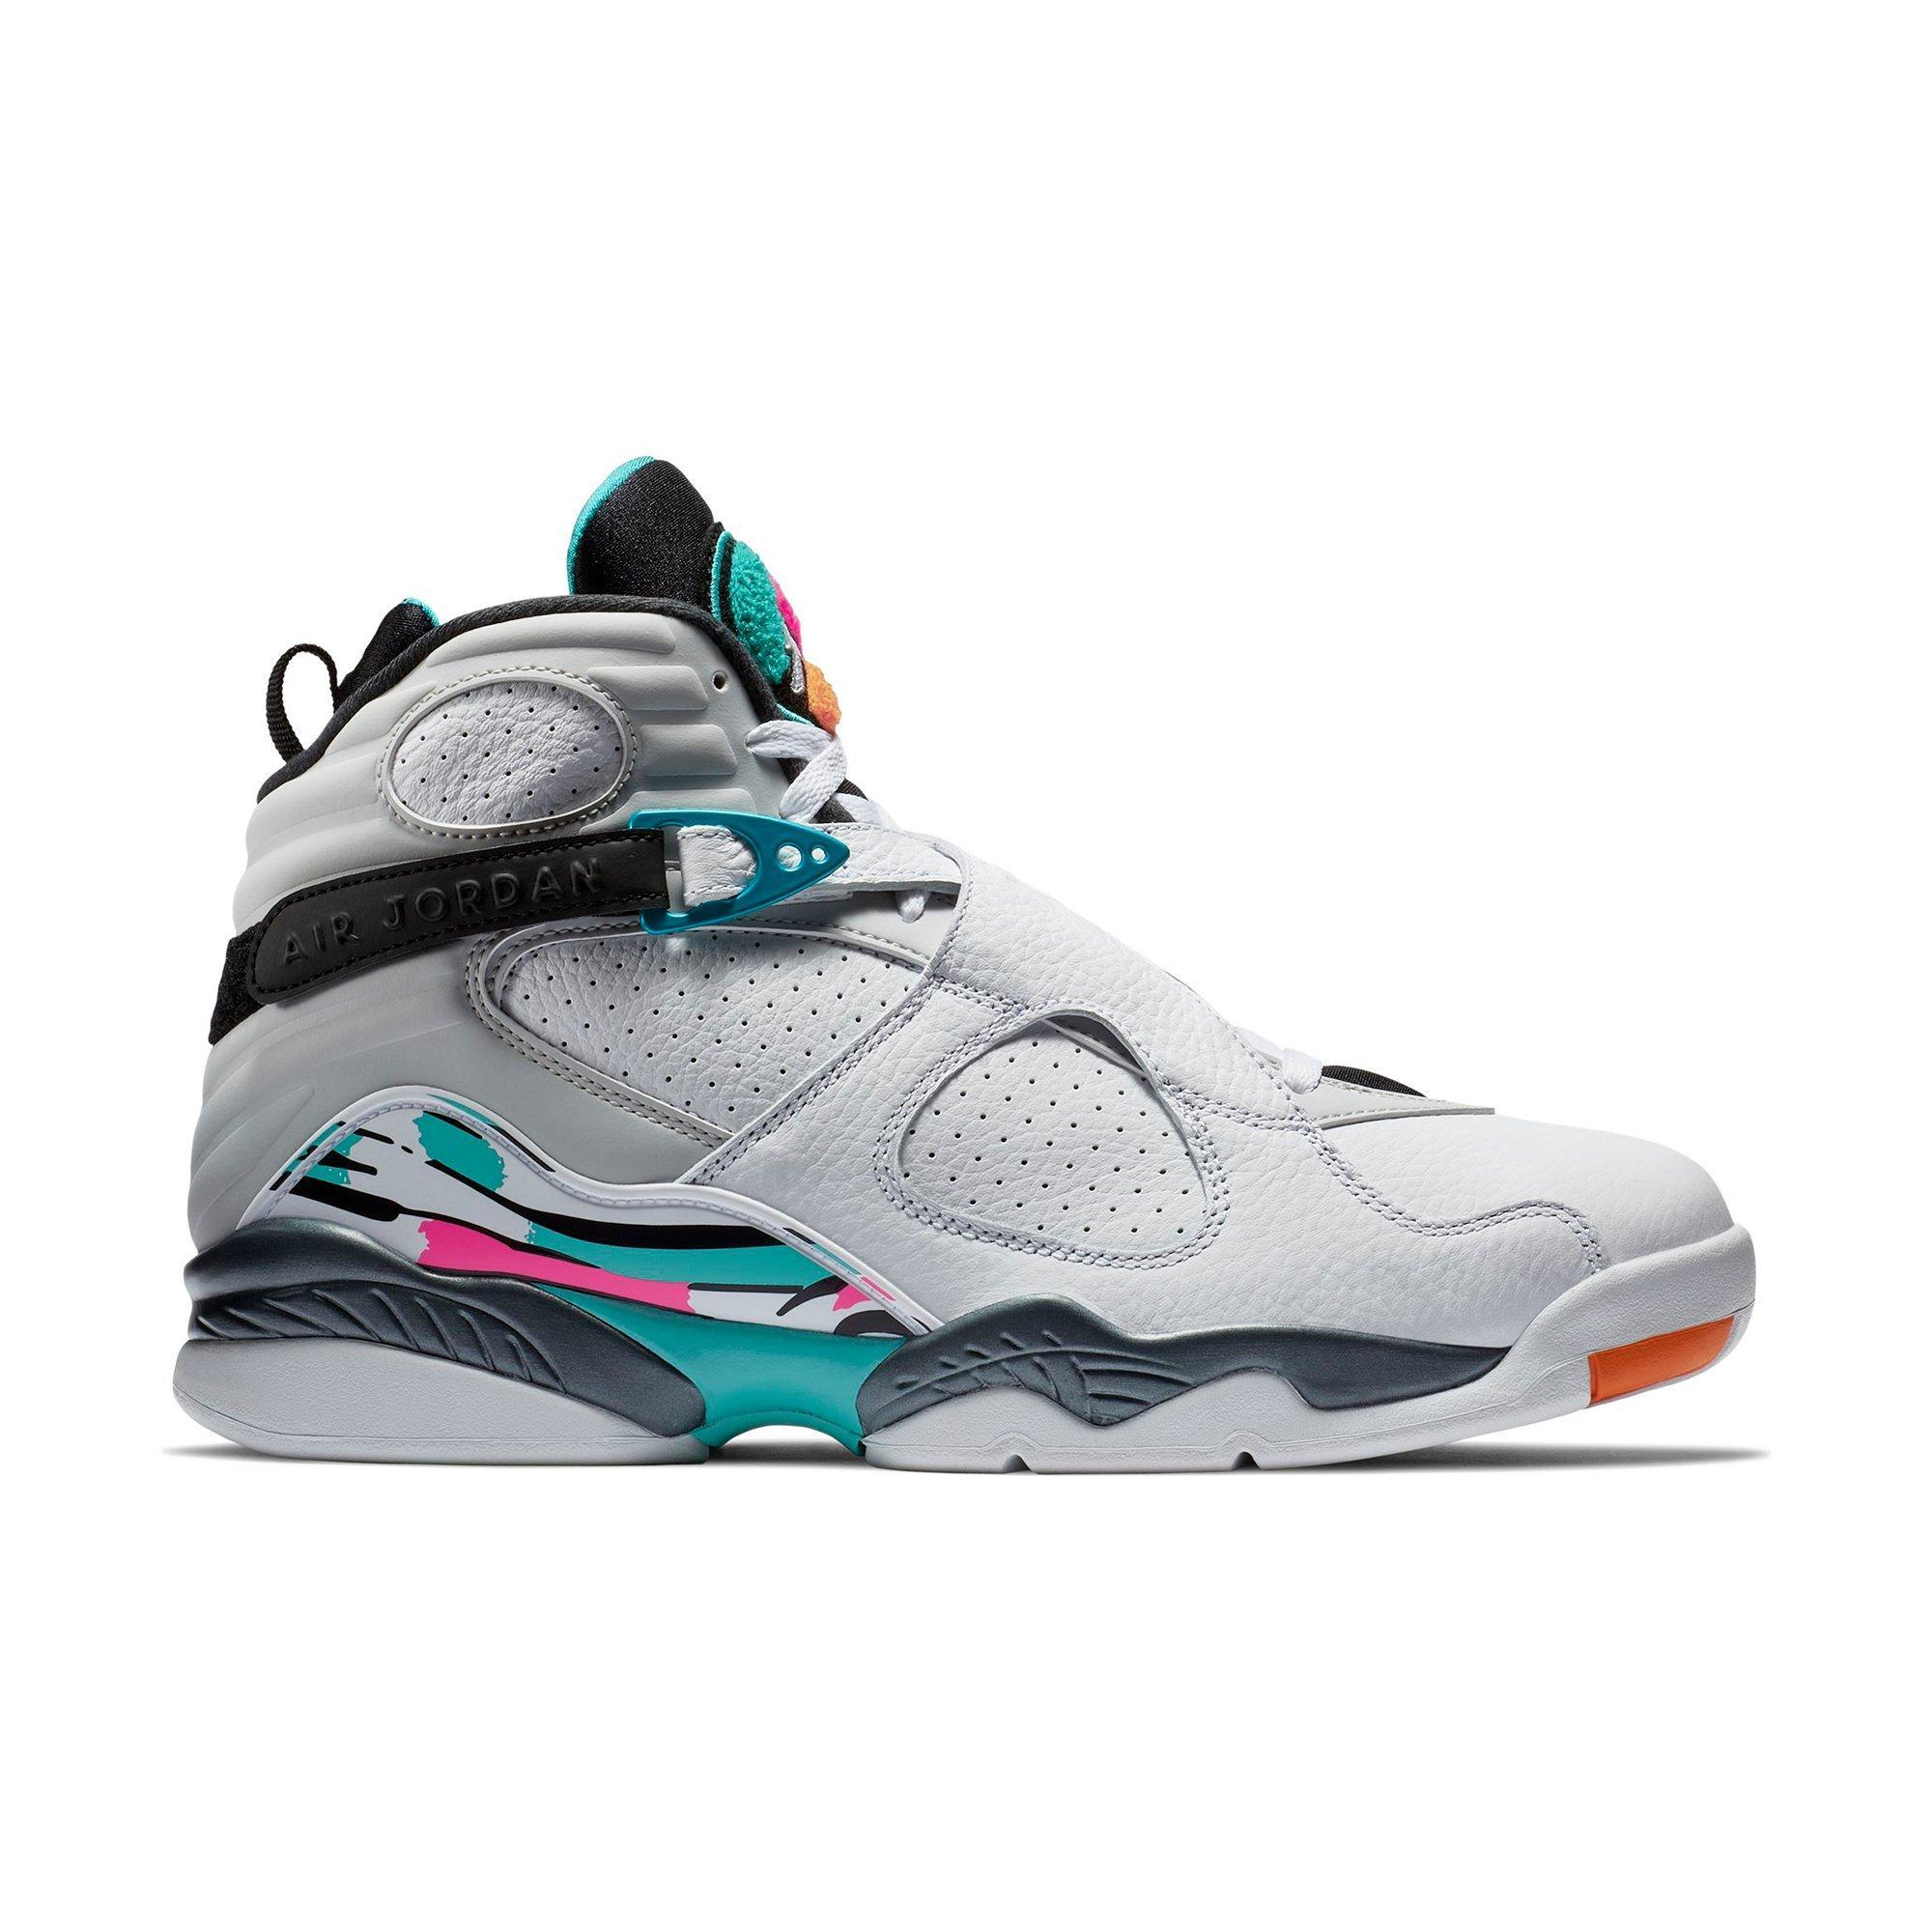 4b5a36110 Turbo Green Jordans Nike Jersey